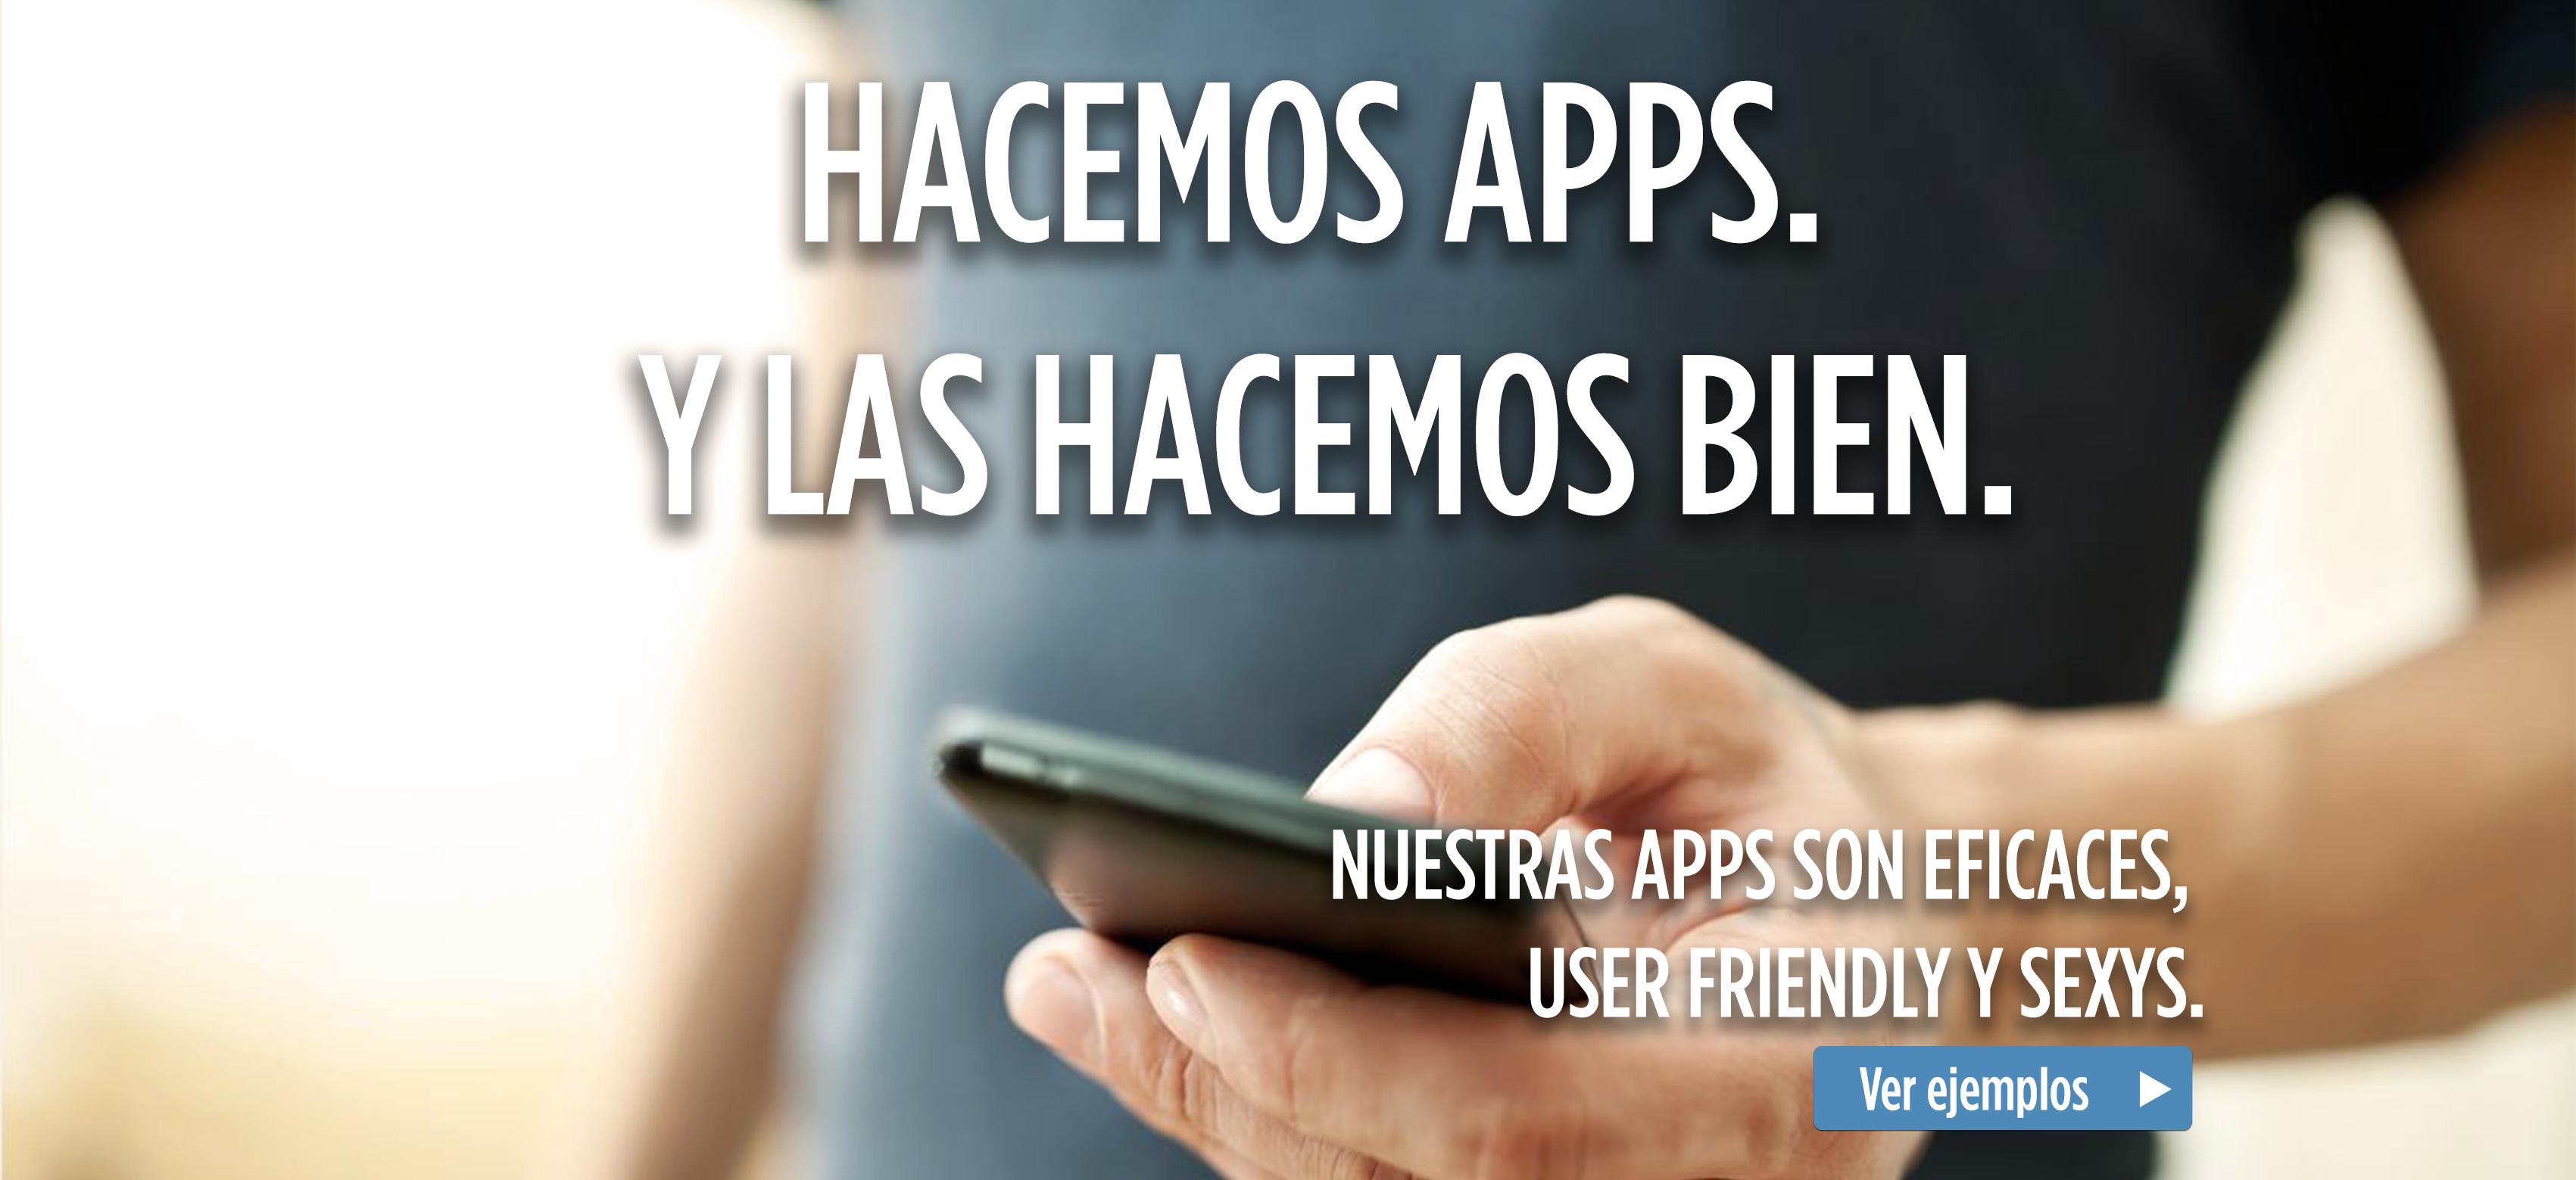 Clapp | Hacemos apps